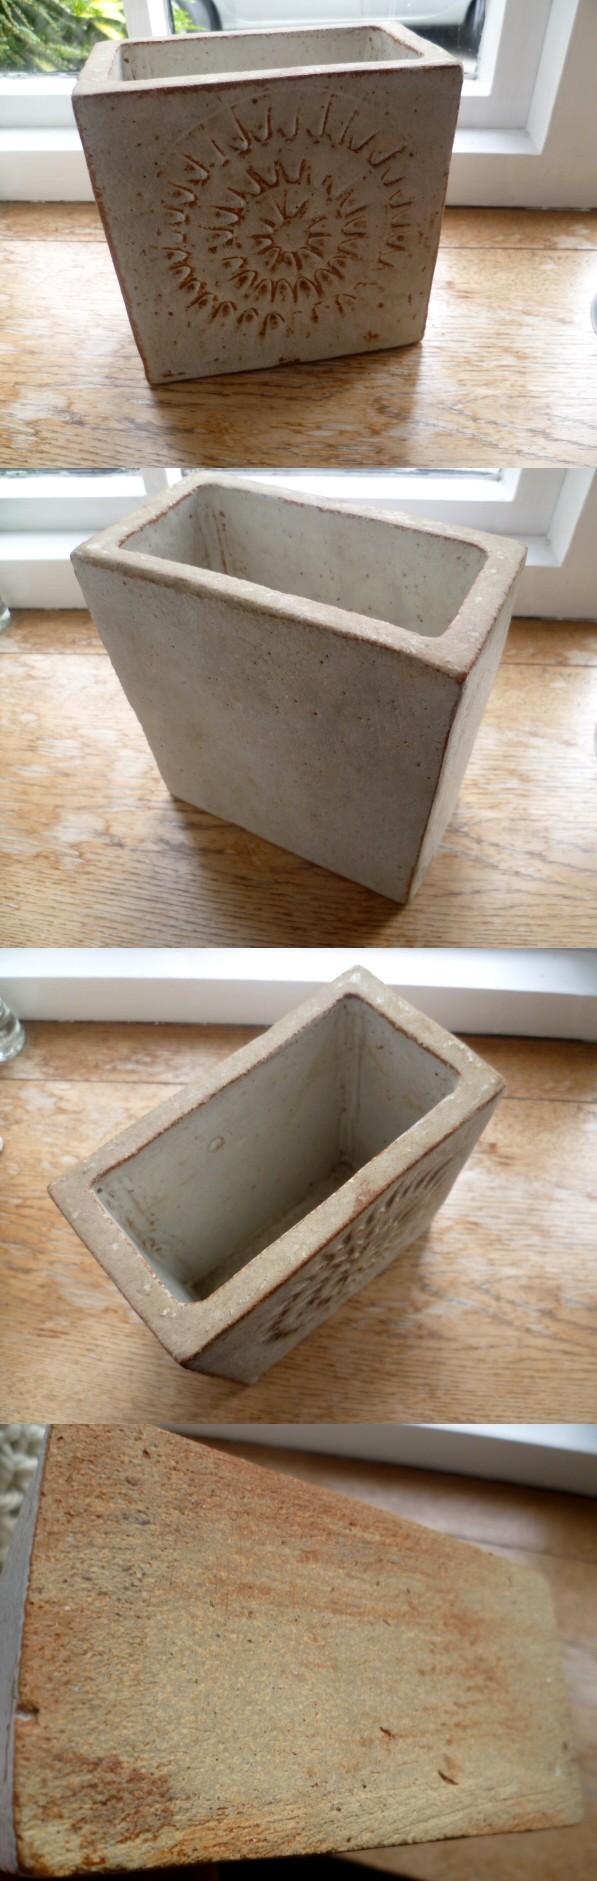 Sunburst slab vase in the style of Wallwork / Hudson Aslab10